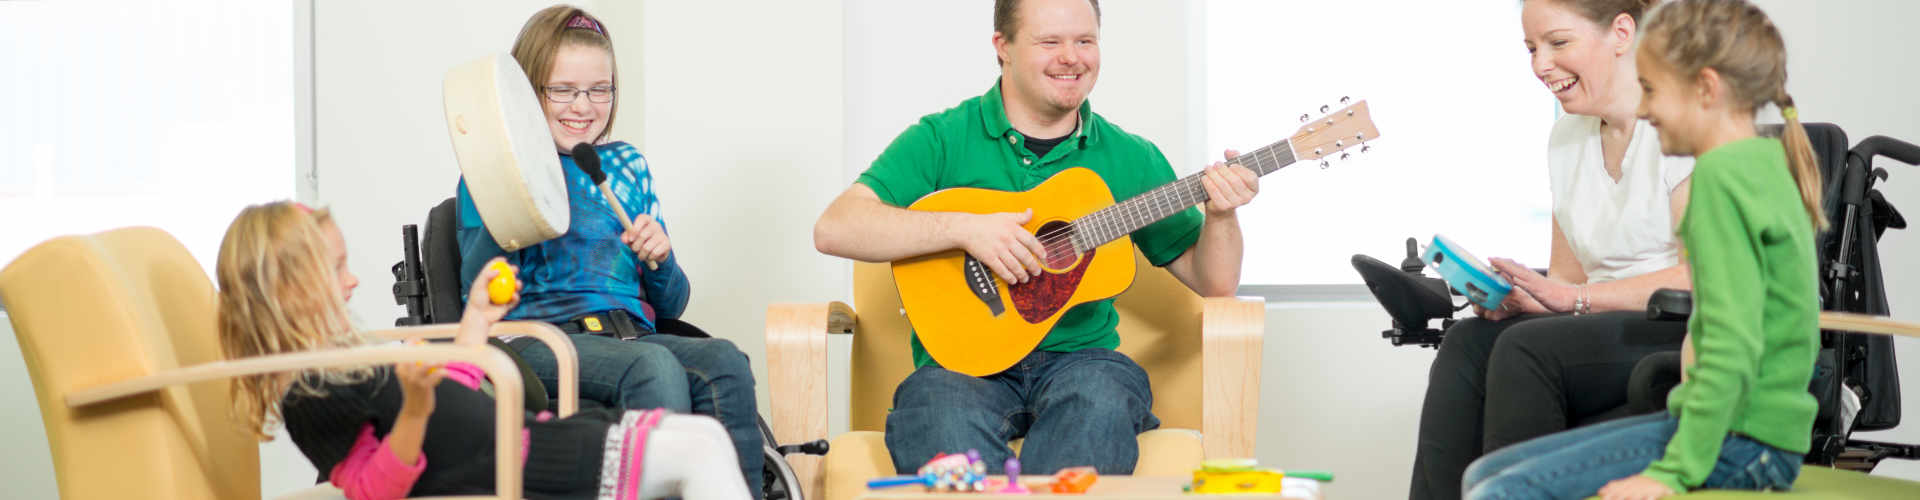 Blackpool Music Academy Community Music Group